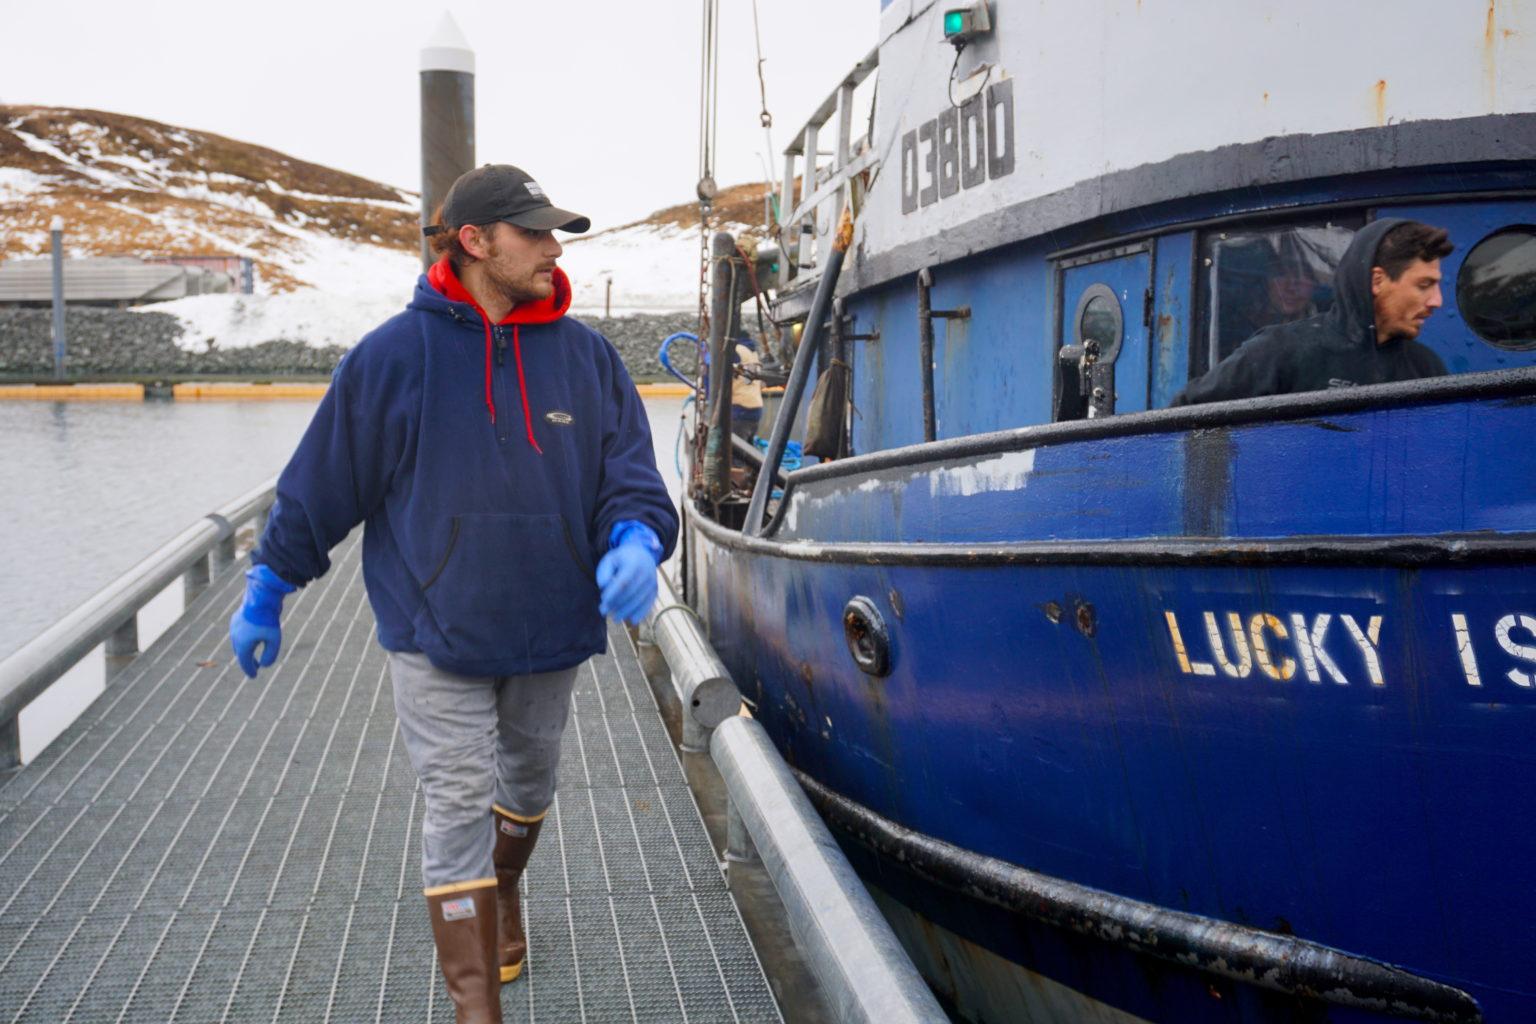 The F/V Lucky Island is docked Friday at Carl E. Moses Harbor on the Aleutian Island of Unalaska.